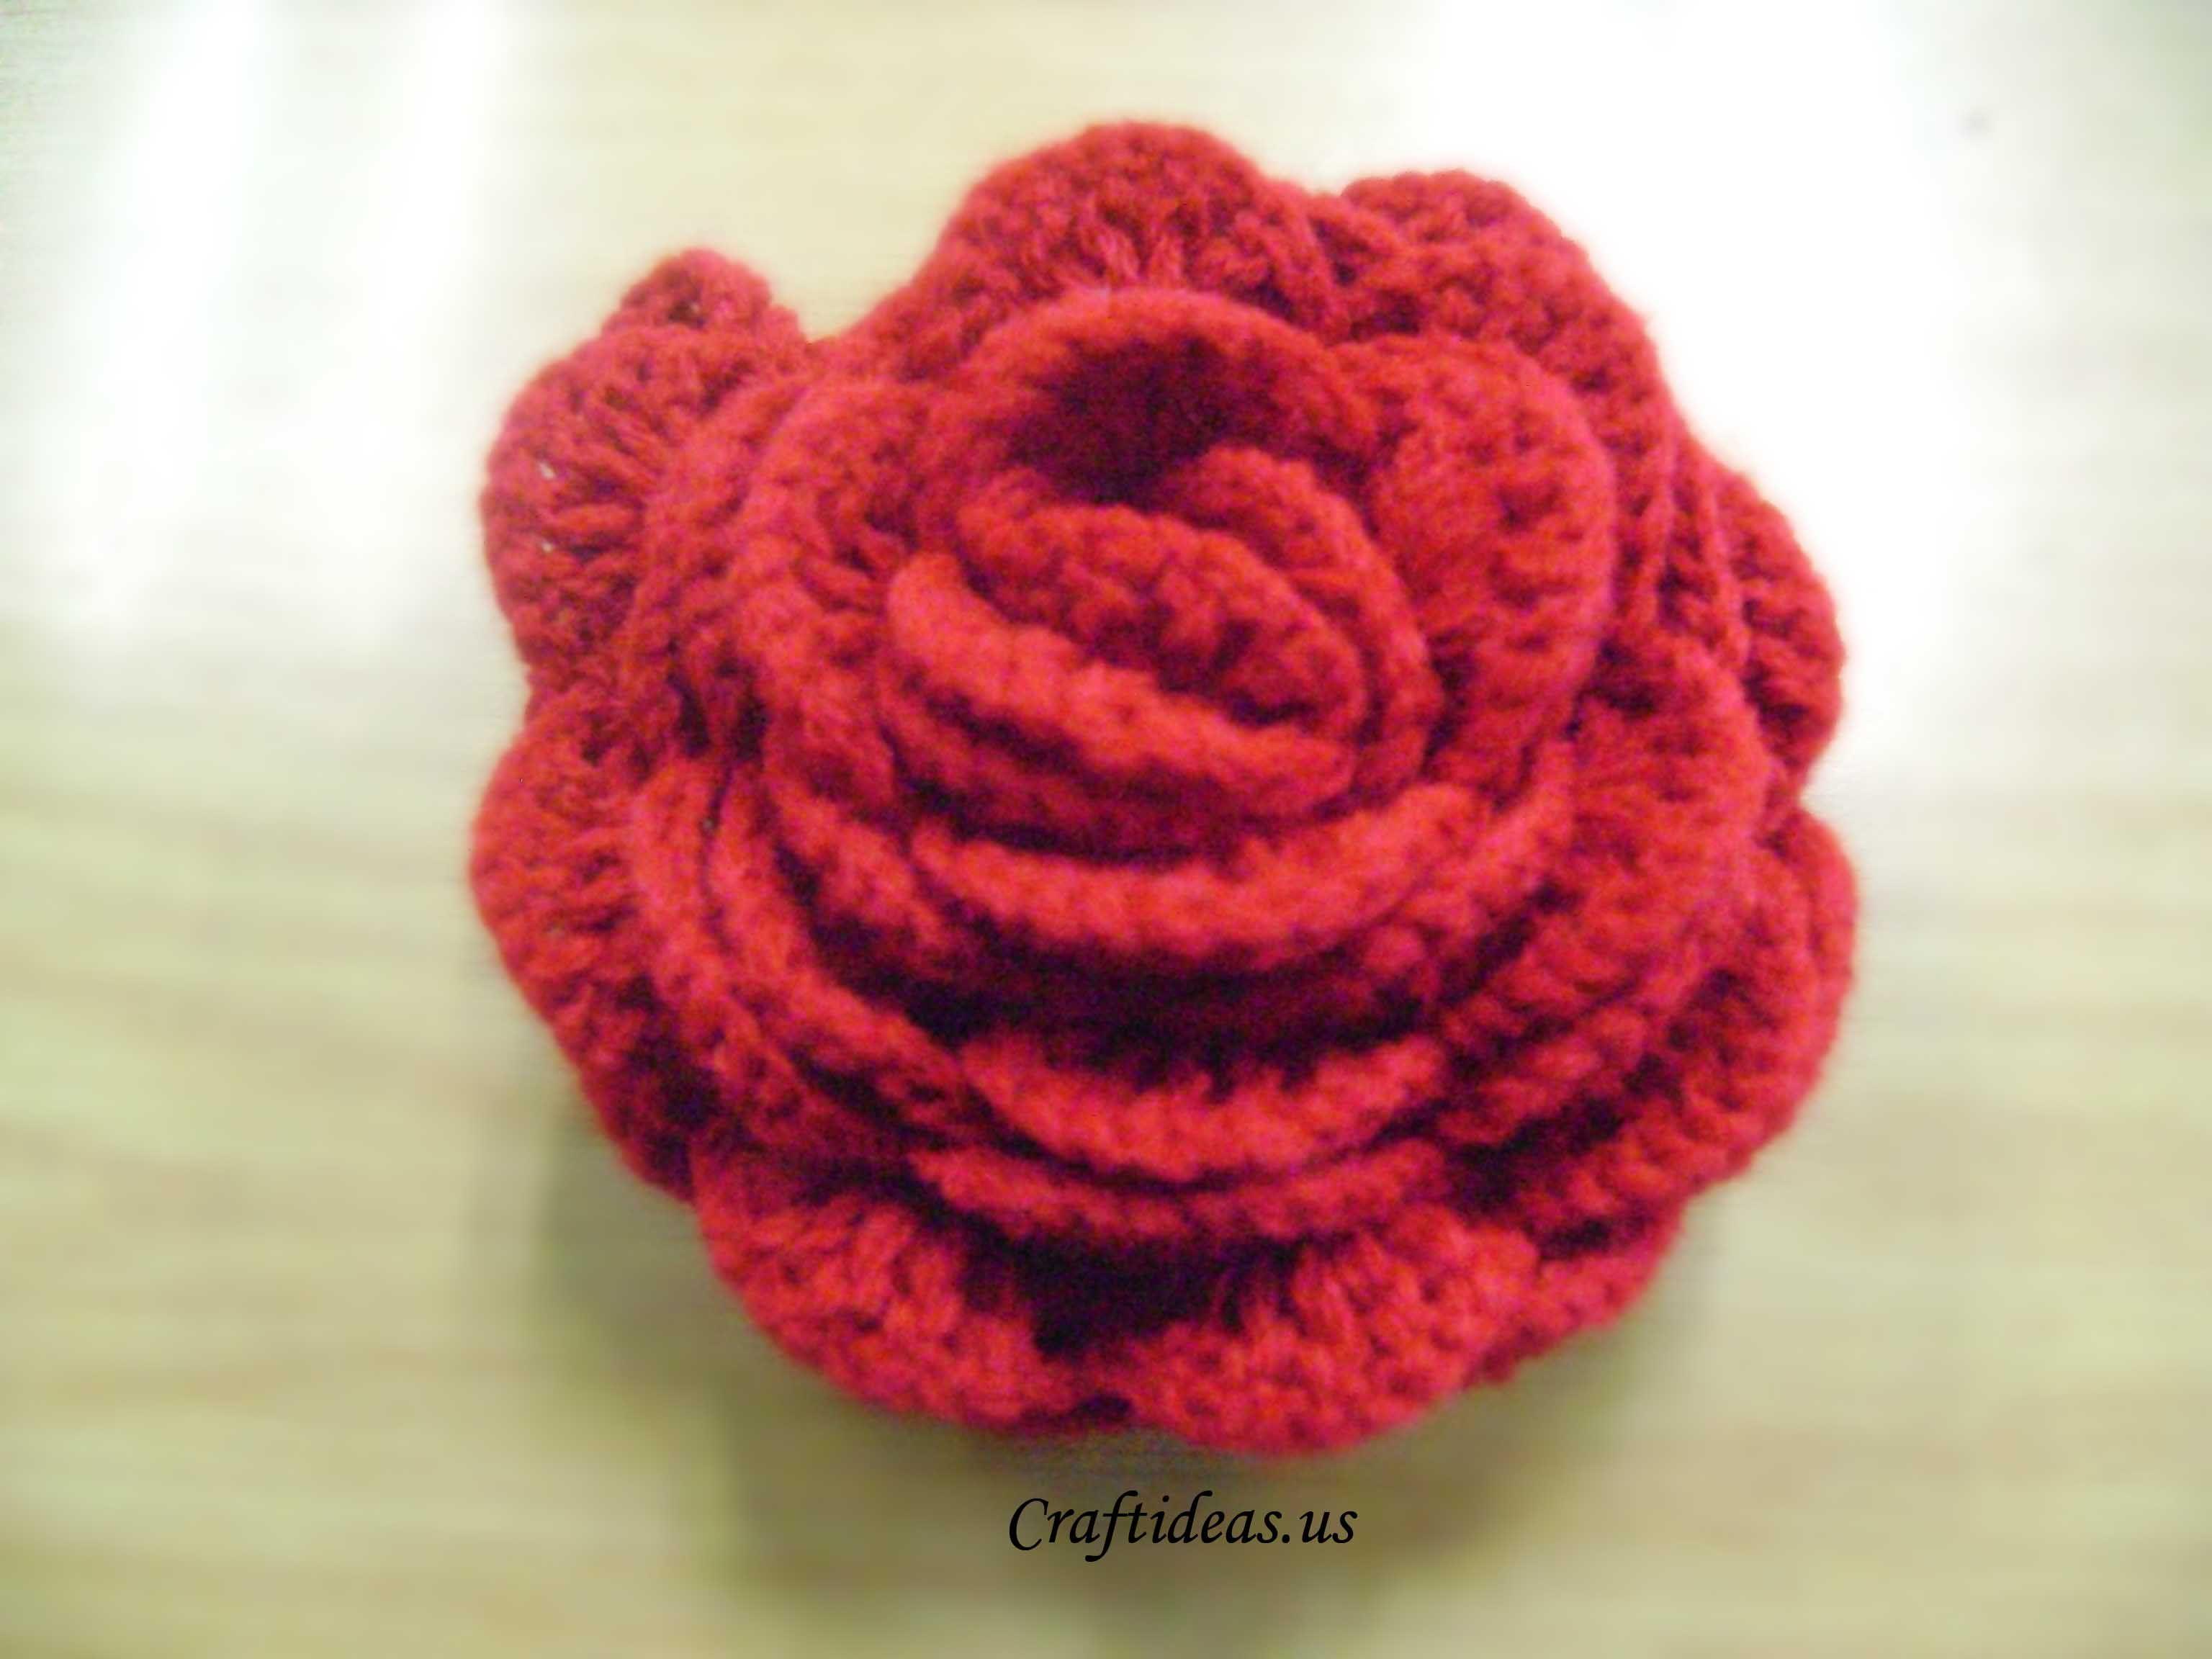 crochet rose ~ free pattern   Crochet Ebelishments   Pinterest ...